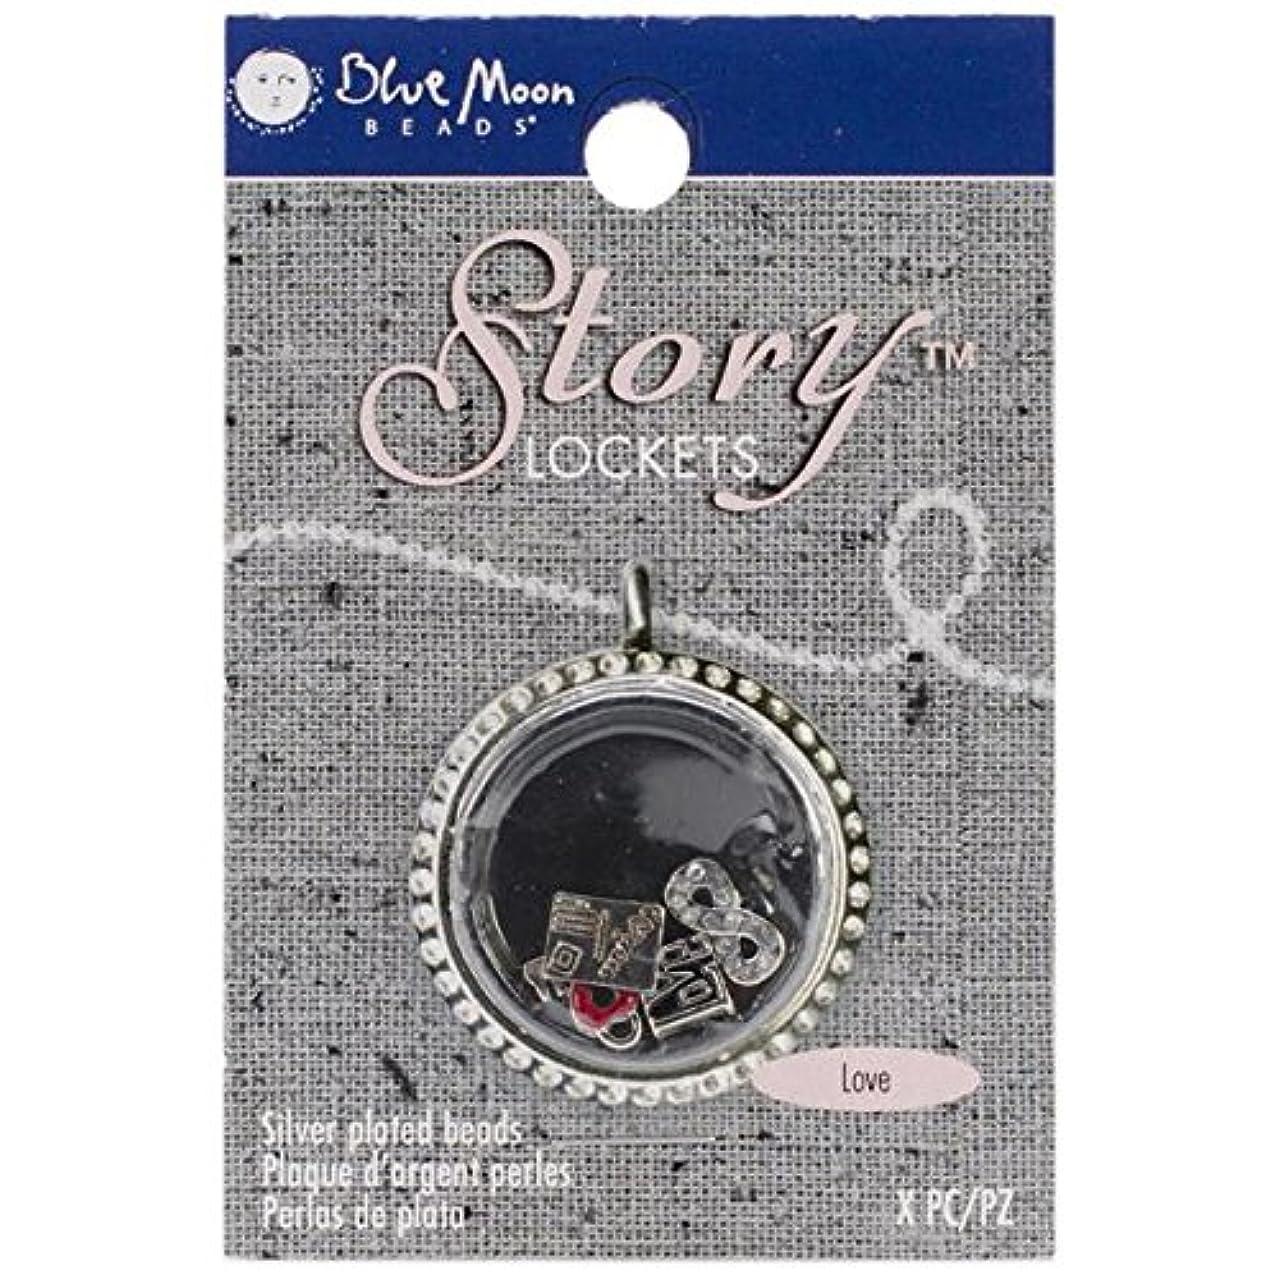 Blue Moon Beads SLKCHRM-221 Story Lockets Metal Charm, Love, Assortment, 5-Pack